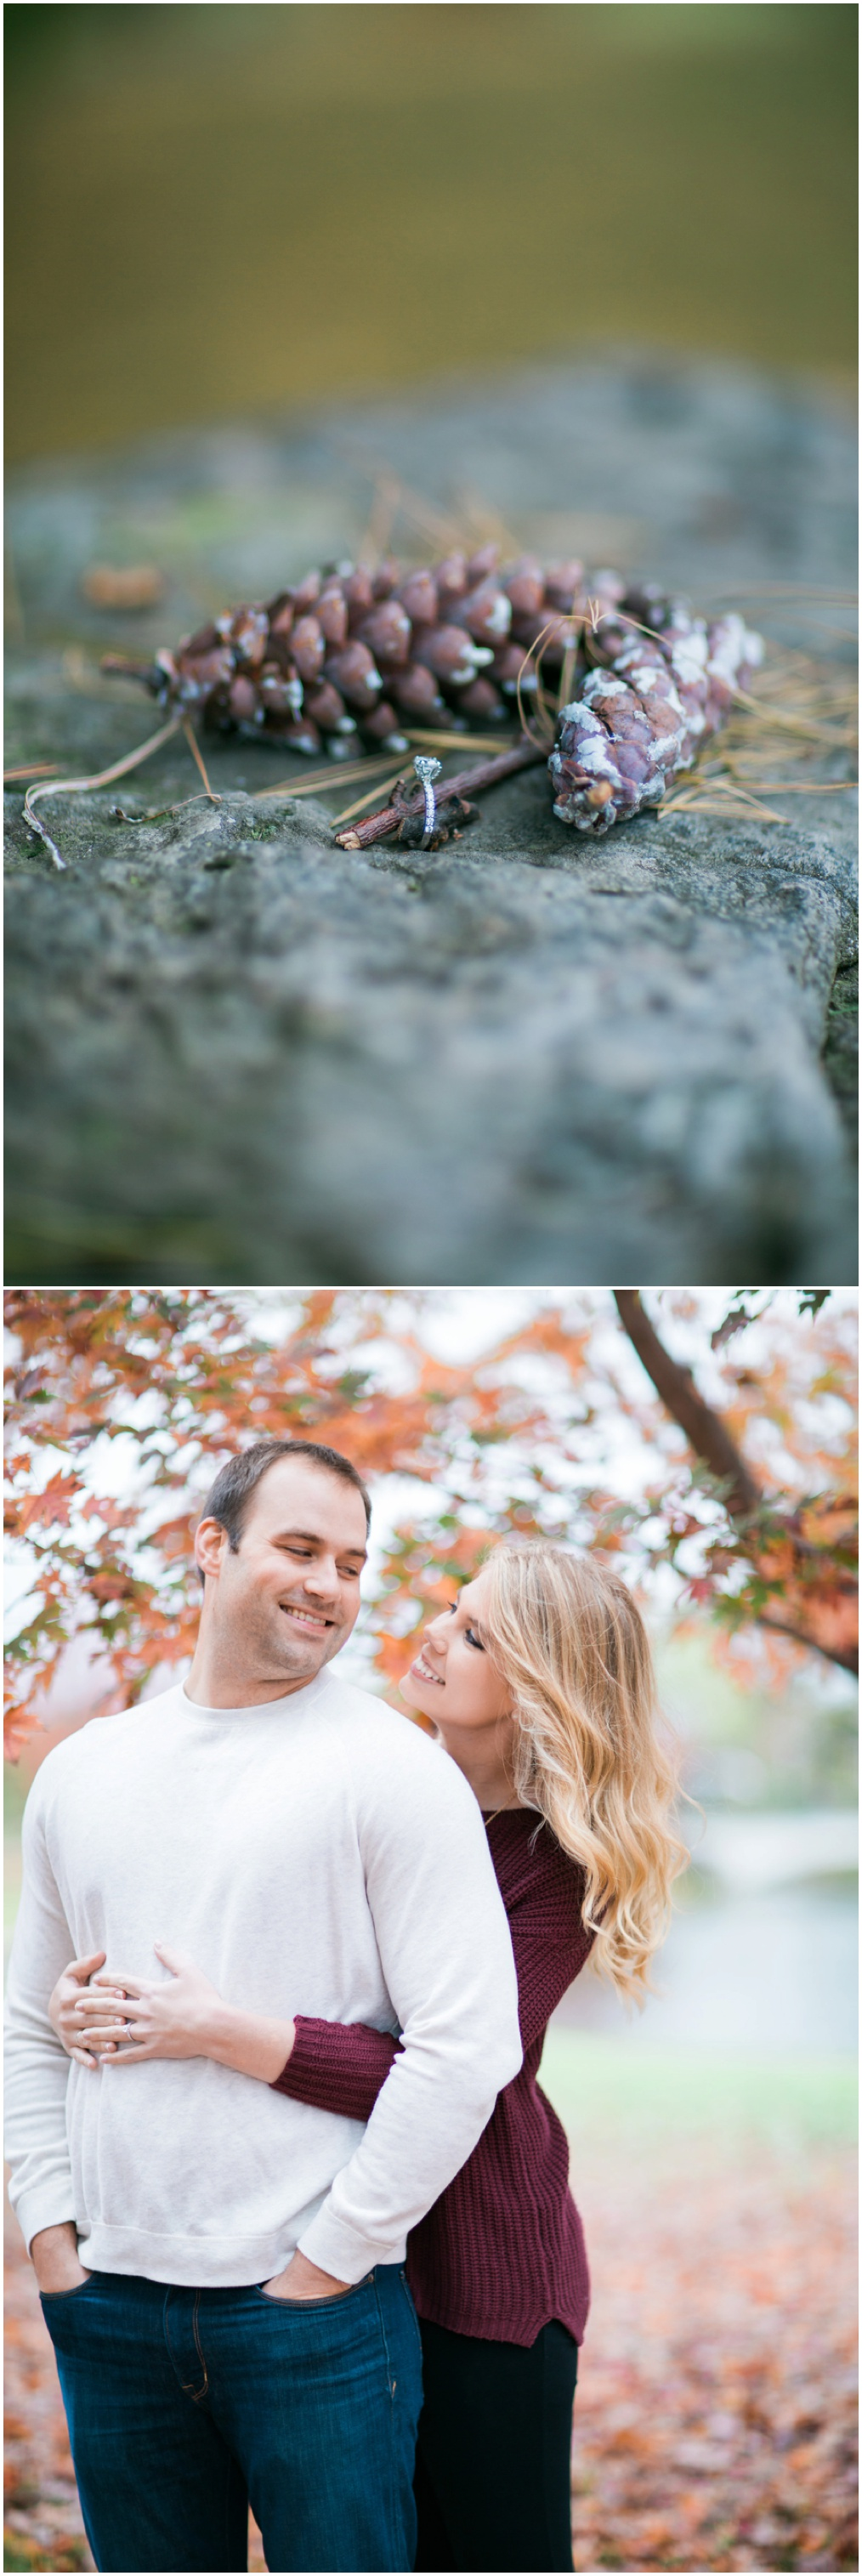 st-louis-engagement-photographs5.jpg